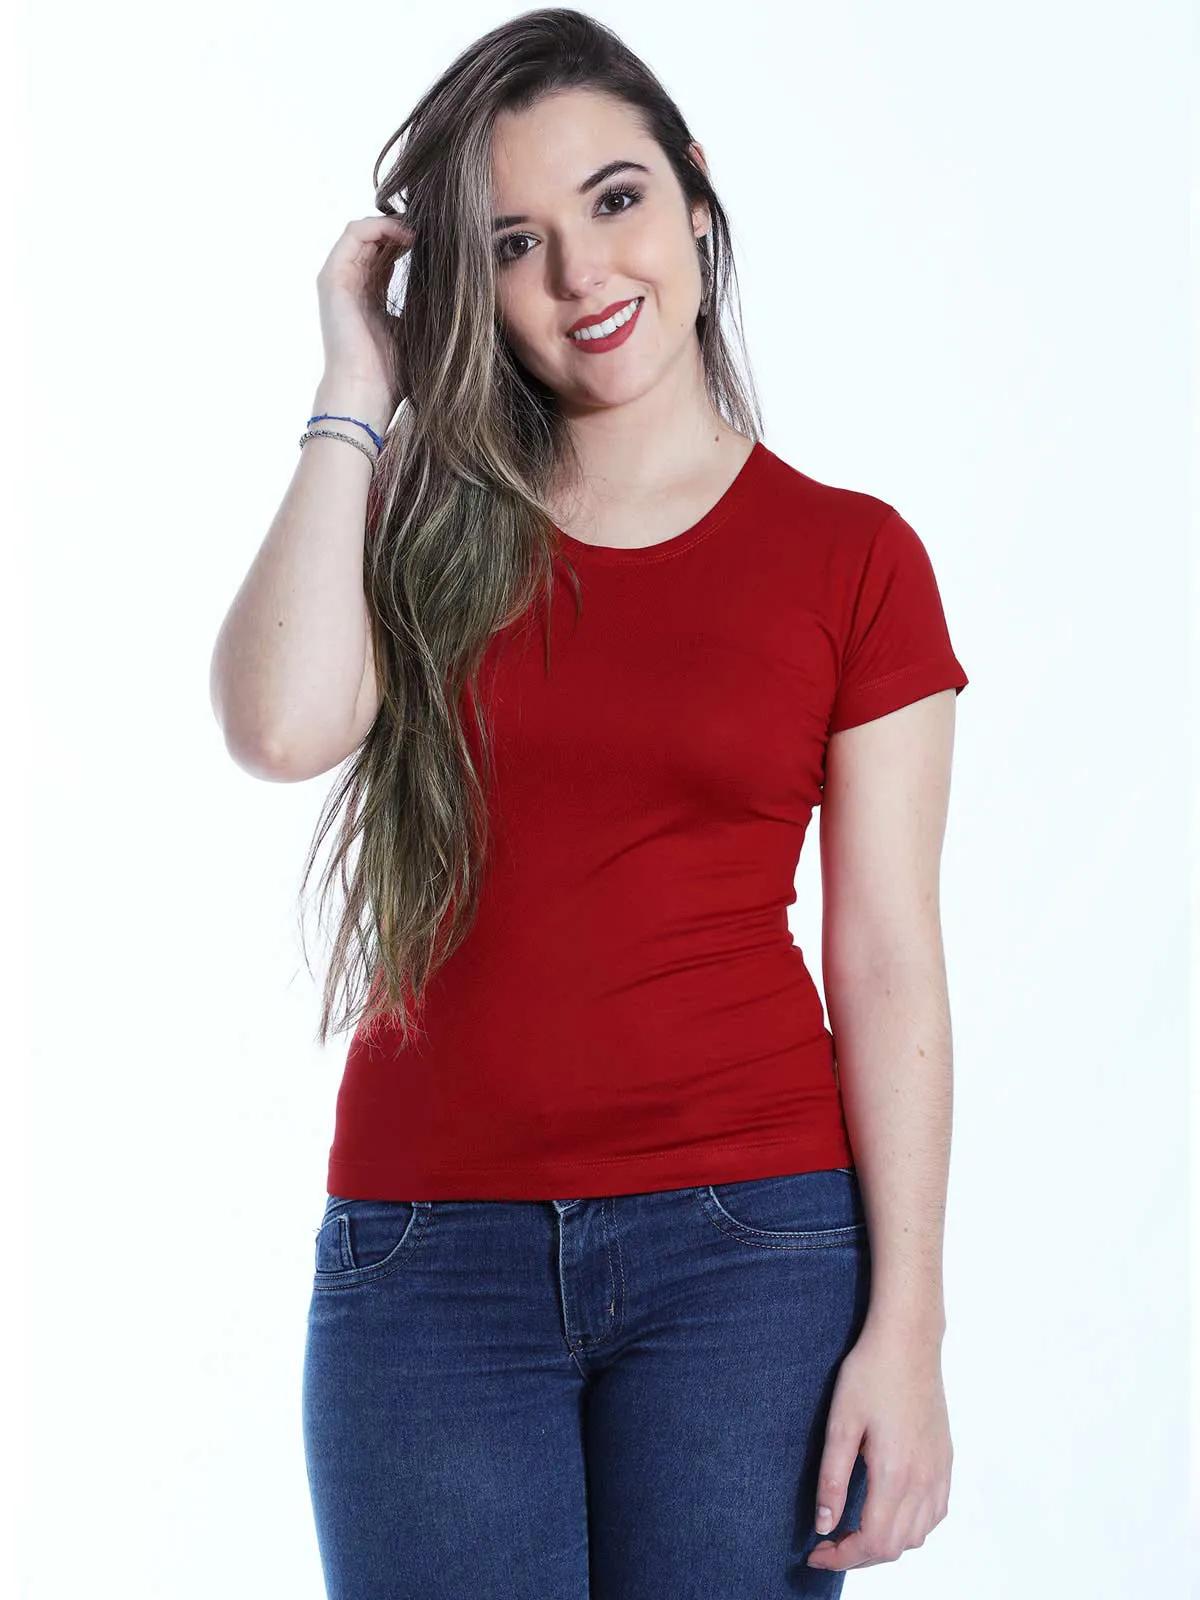 Baby Look Feminina Básica Lisa Viscolycra Decote Redondo Vermelho